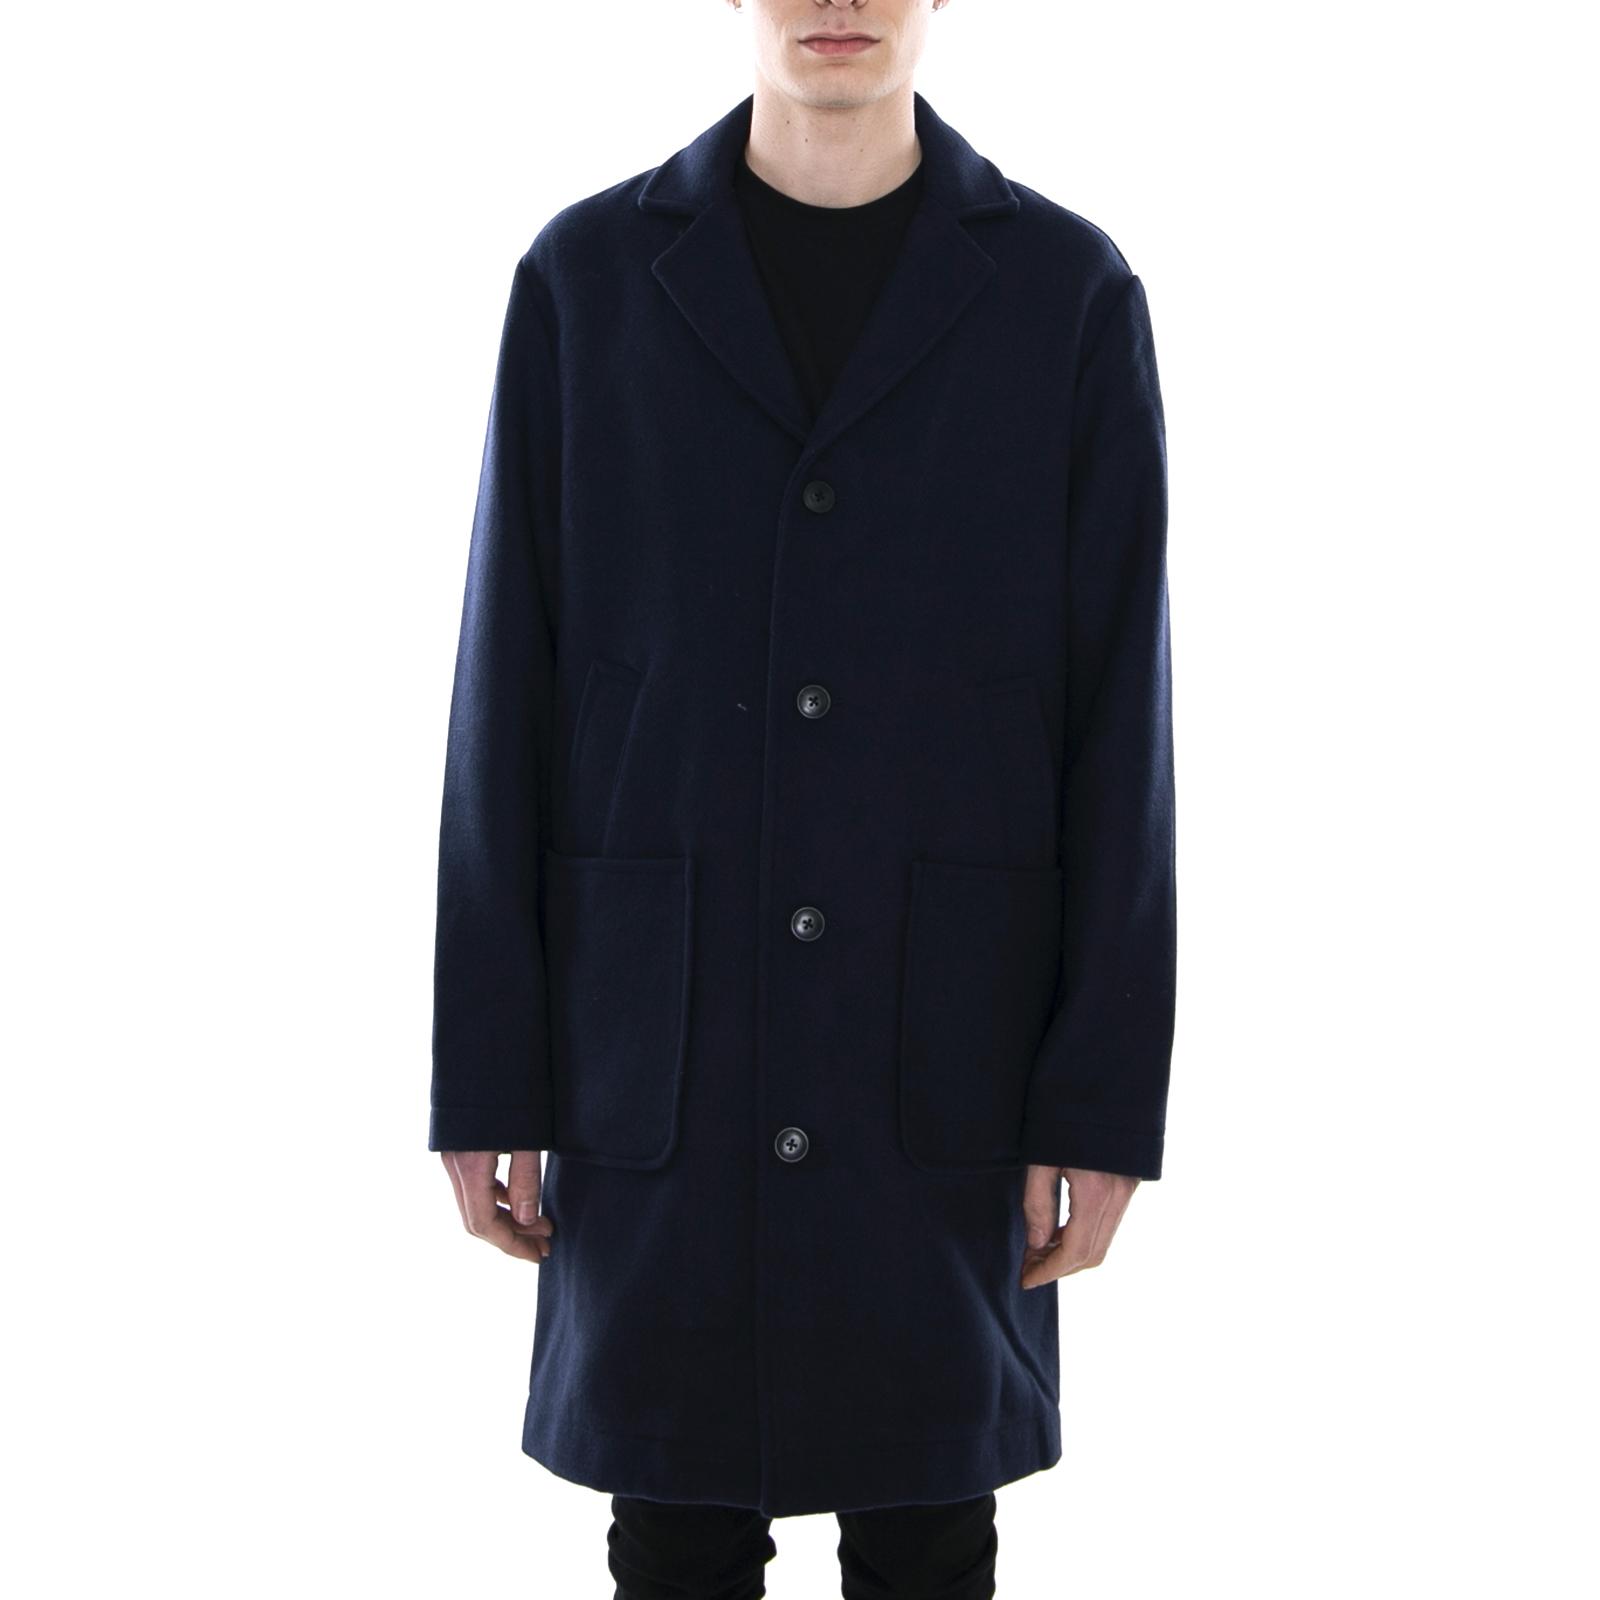 Blue Dark Carhartt Coat Giacche Navy Jenison xzpqP8Y